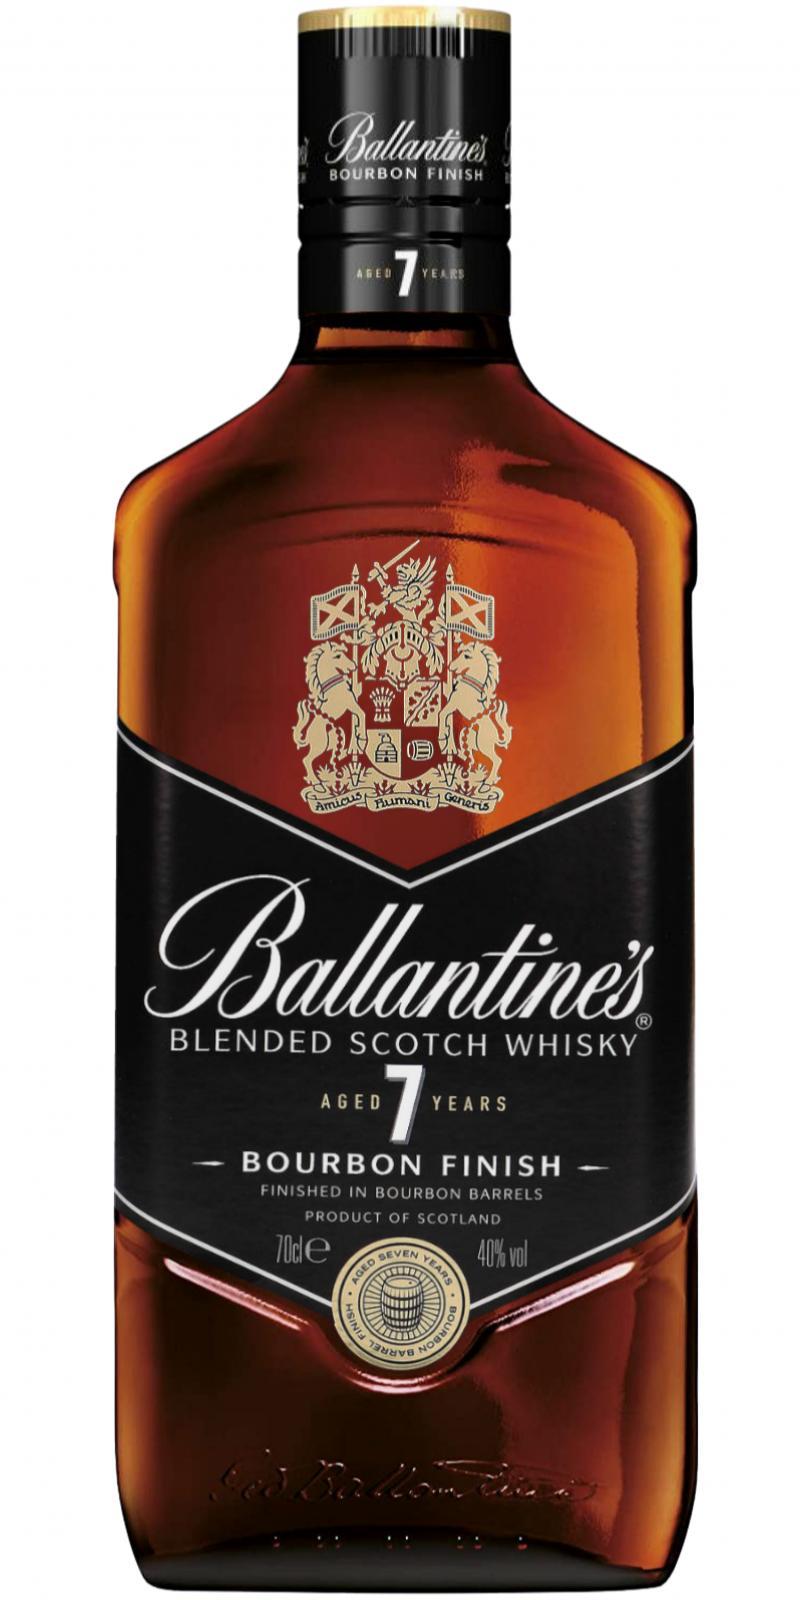 Ballantine's 07-year-old